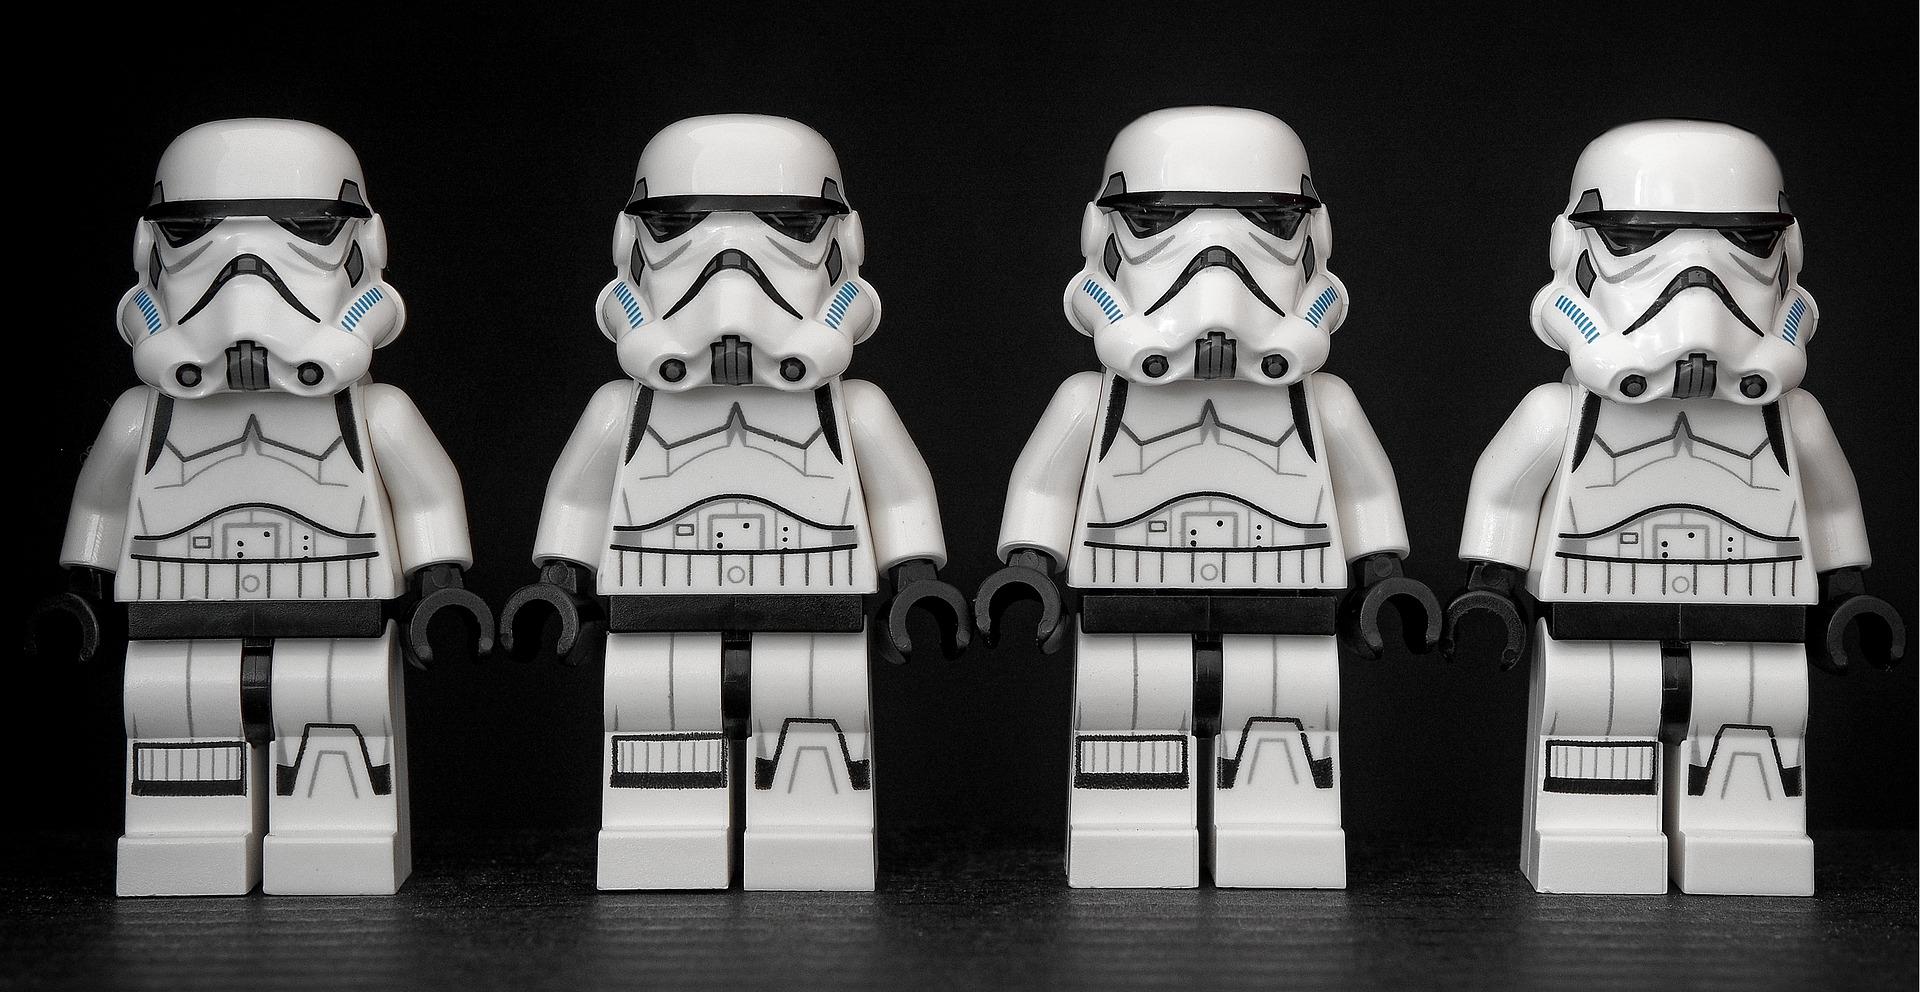 uniforme star wars